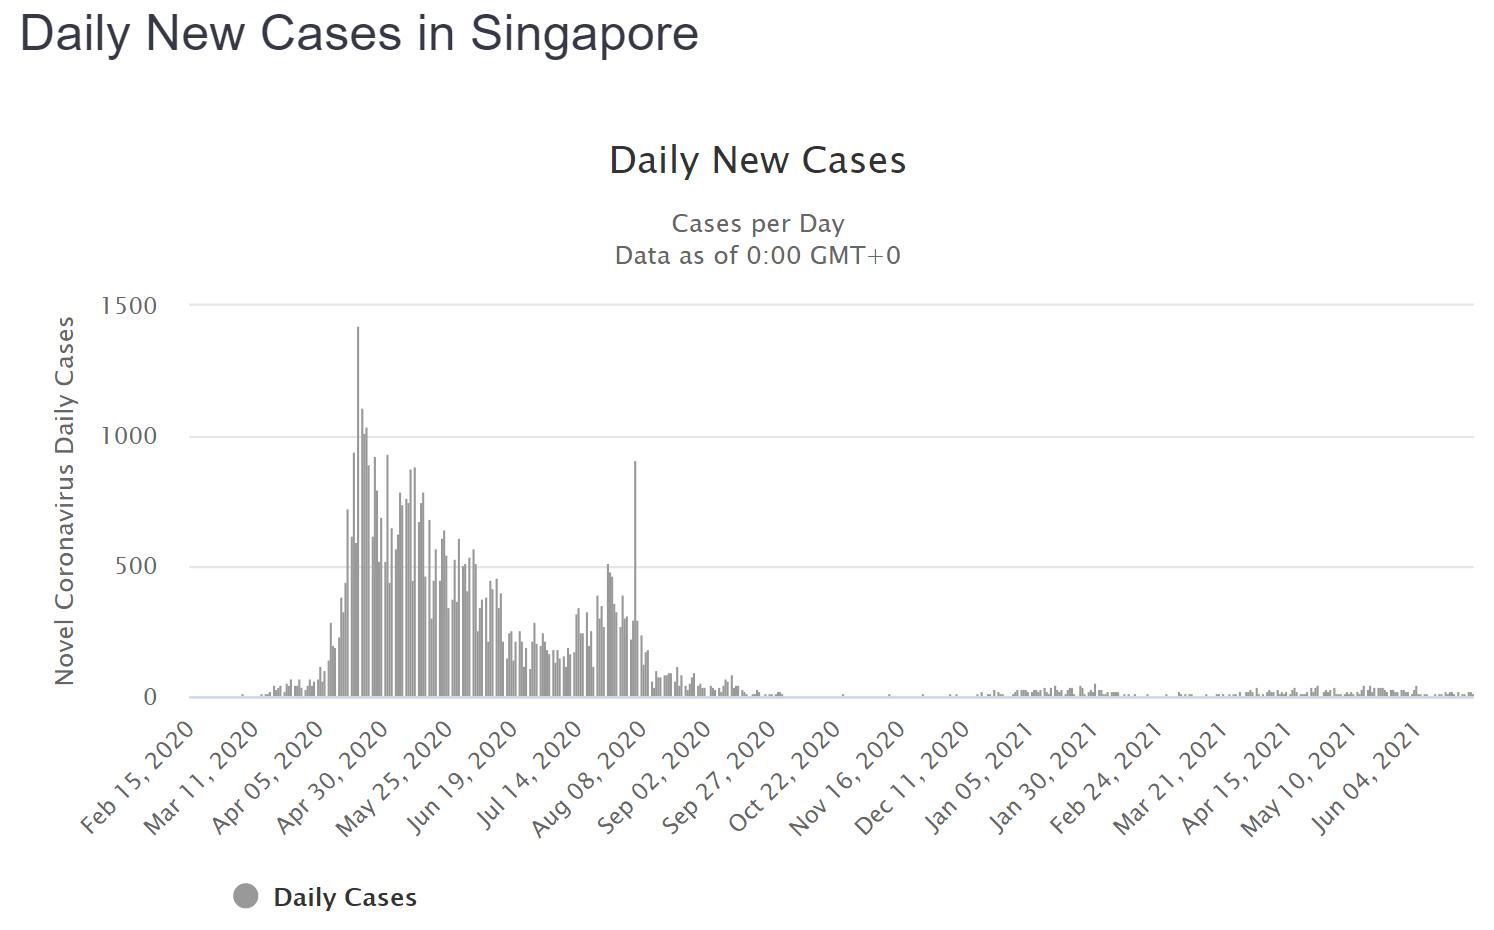 Singapore New Cases, Daily Feb 2020- Jun 2021